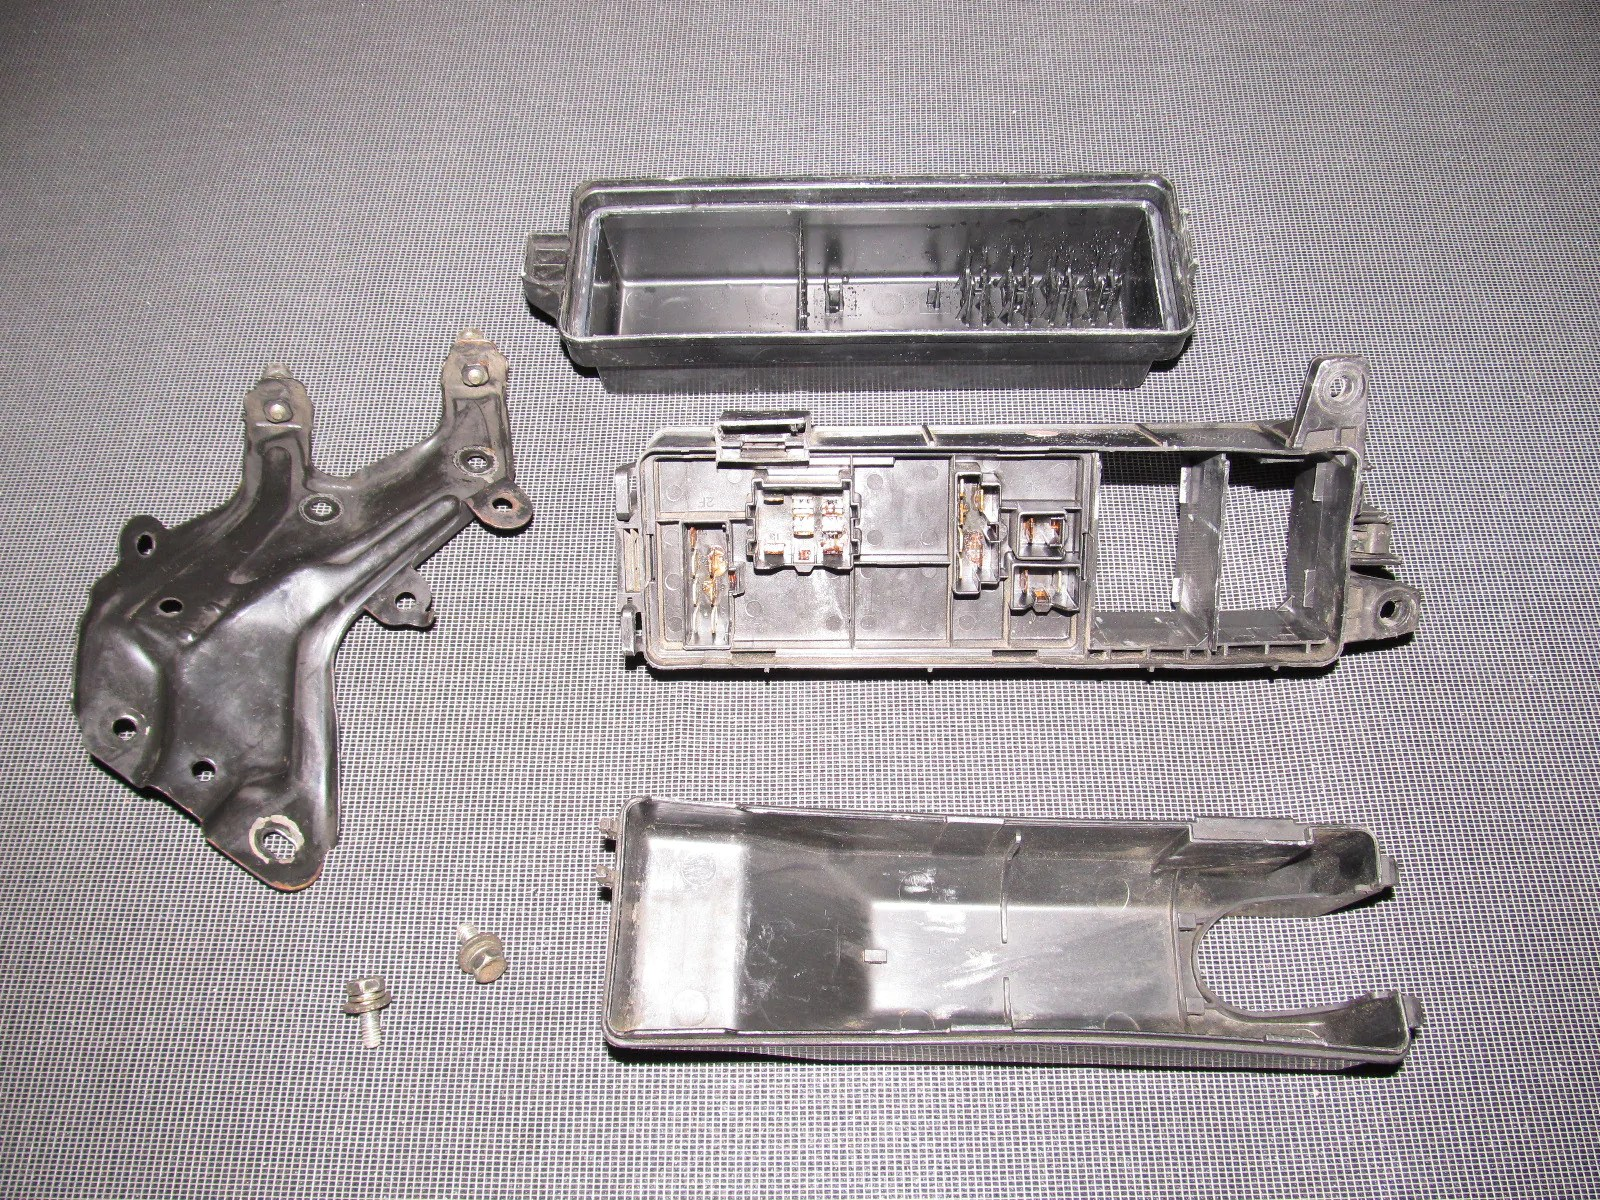 89 90 91 92 toyota supra oem engine fuse box autopartone com 1987 toyota supra fuse [ 1600 x 1200 Pixel ]